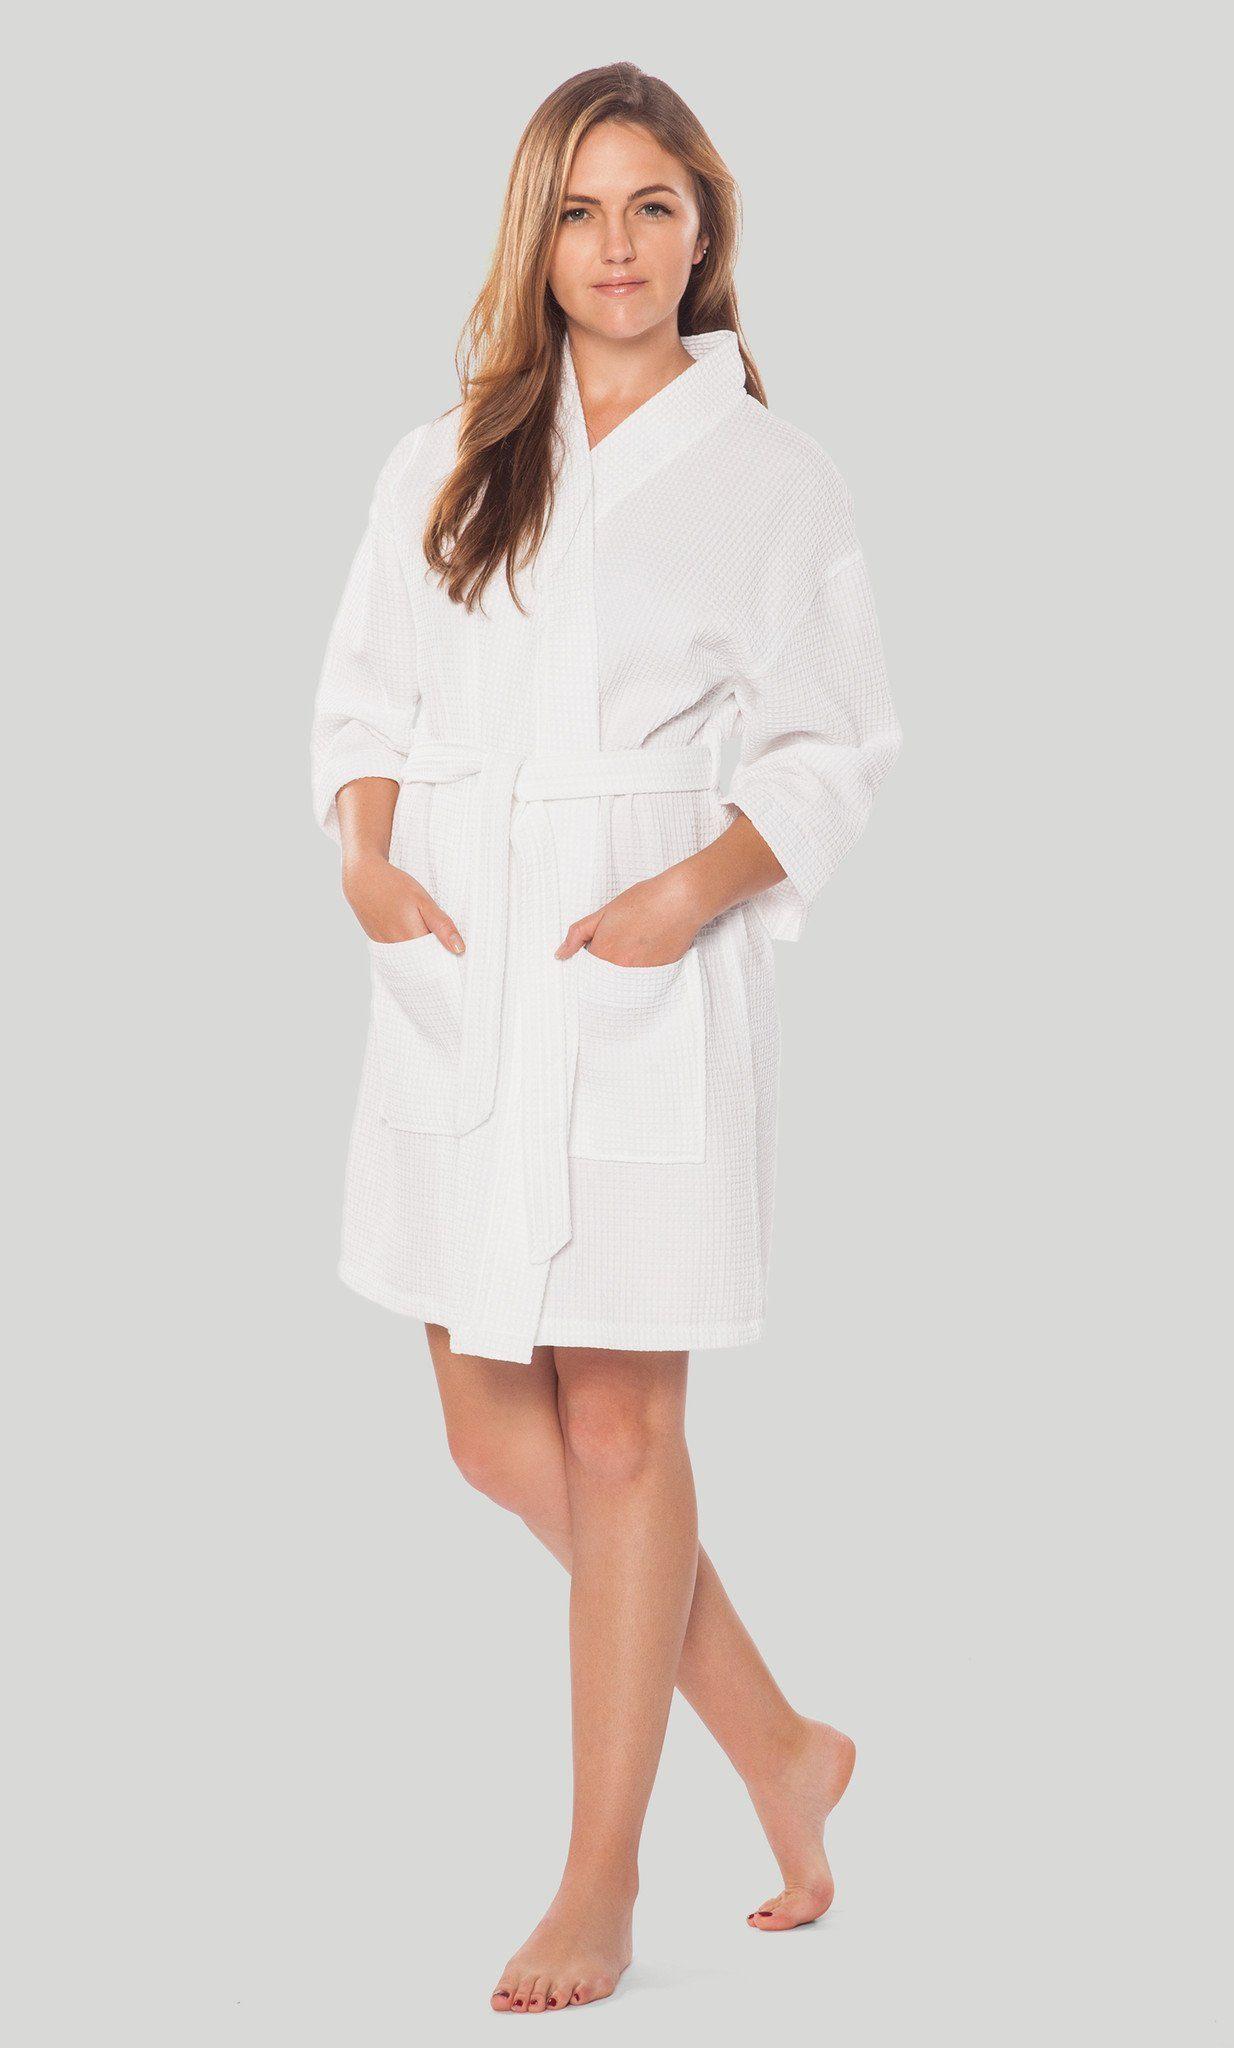 Waffle-Kimono-White-Short-Robe-Square-Pattern-Robemart 2048x2048 ... a12246d3e